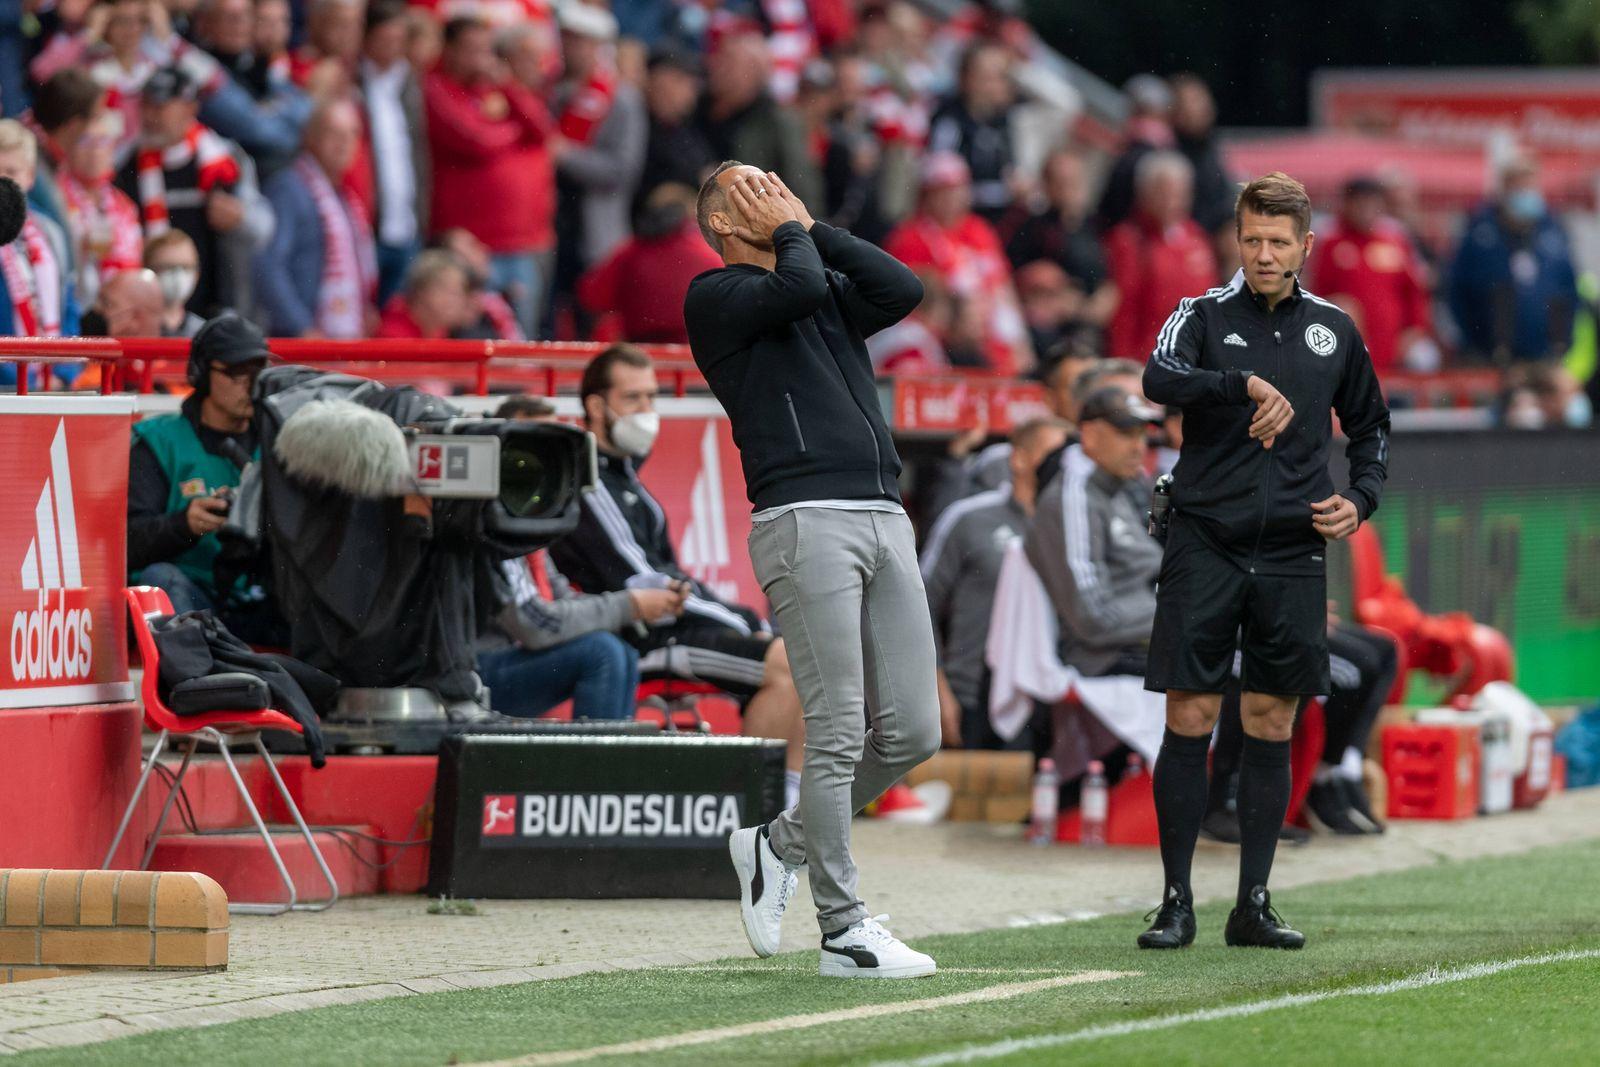 Fussball Berlin 29.08.2021 Saison 2021 / 2022 1. Bundesliga / DFL 1. FC Union Berlin vs Borussia Mönchengladbach Adolf